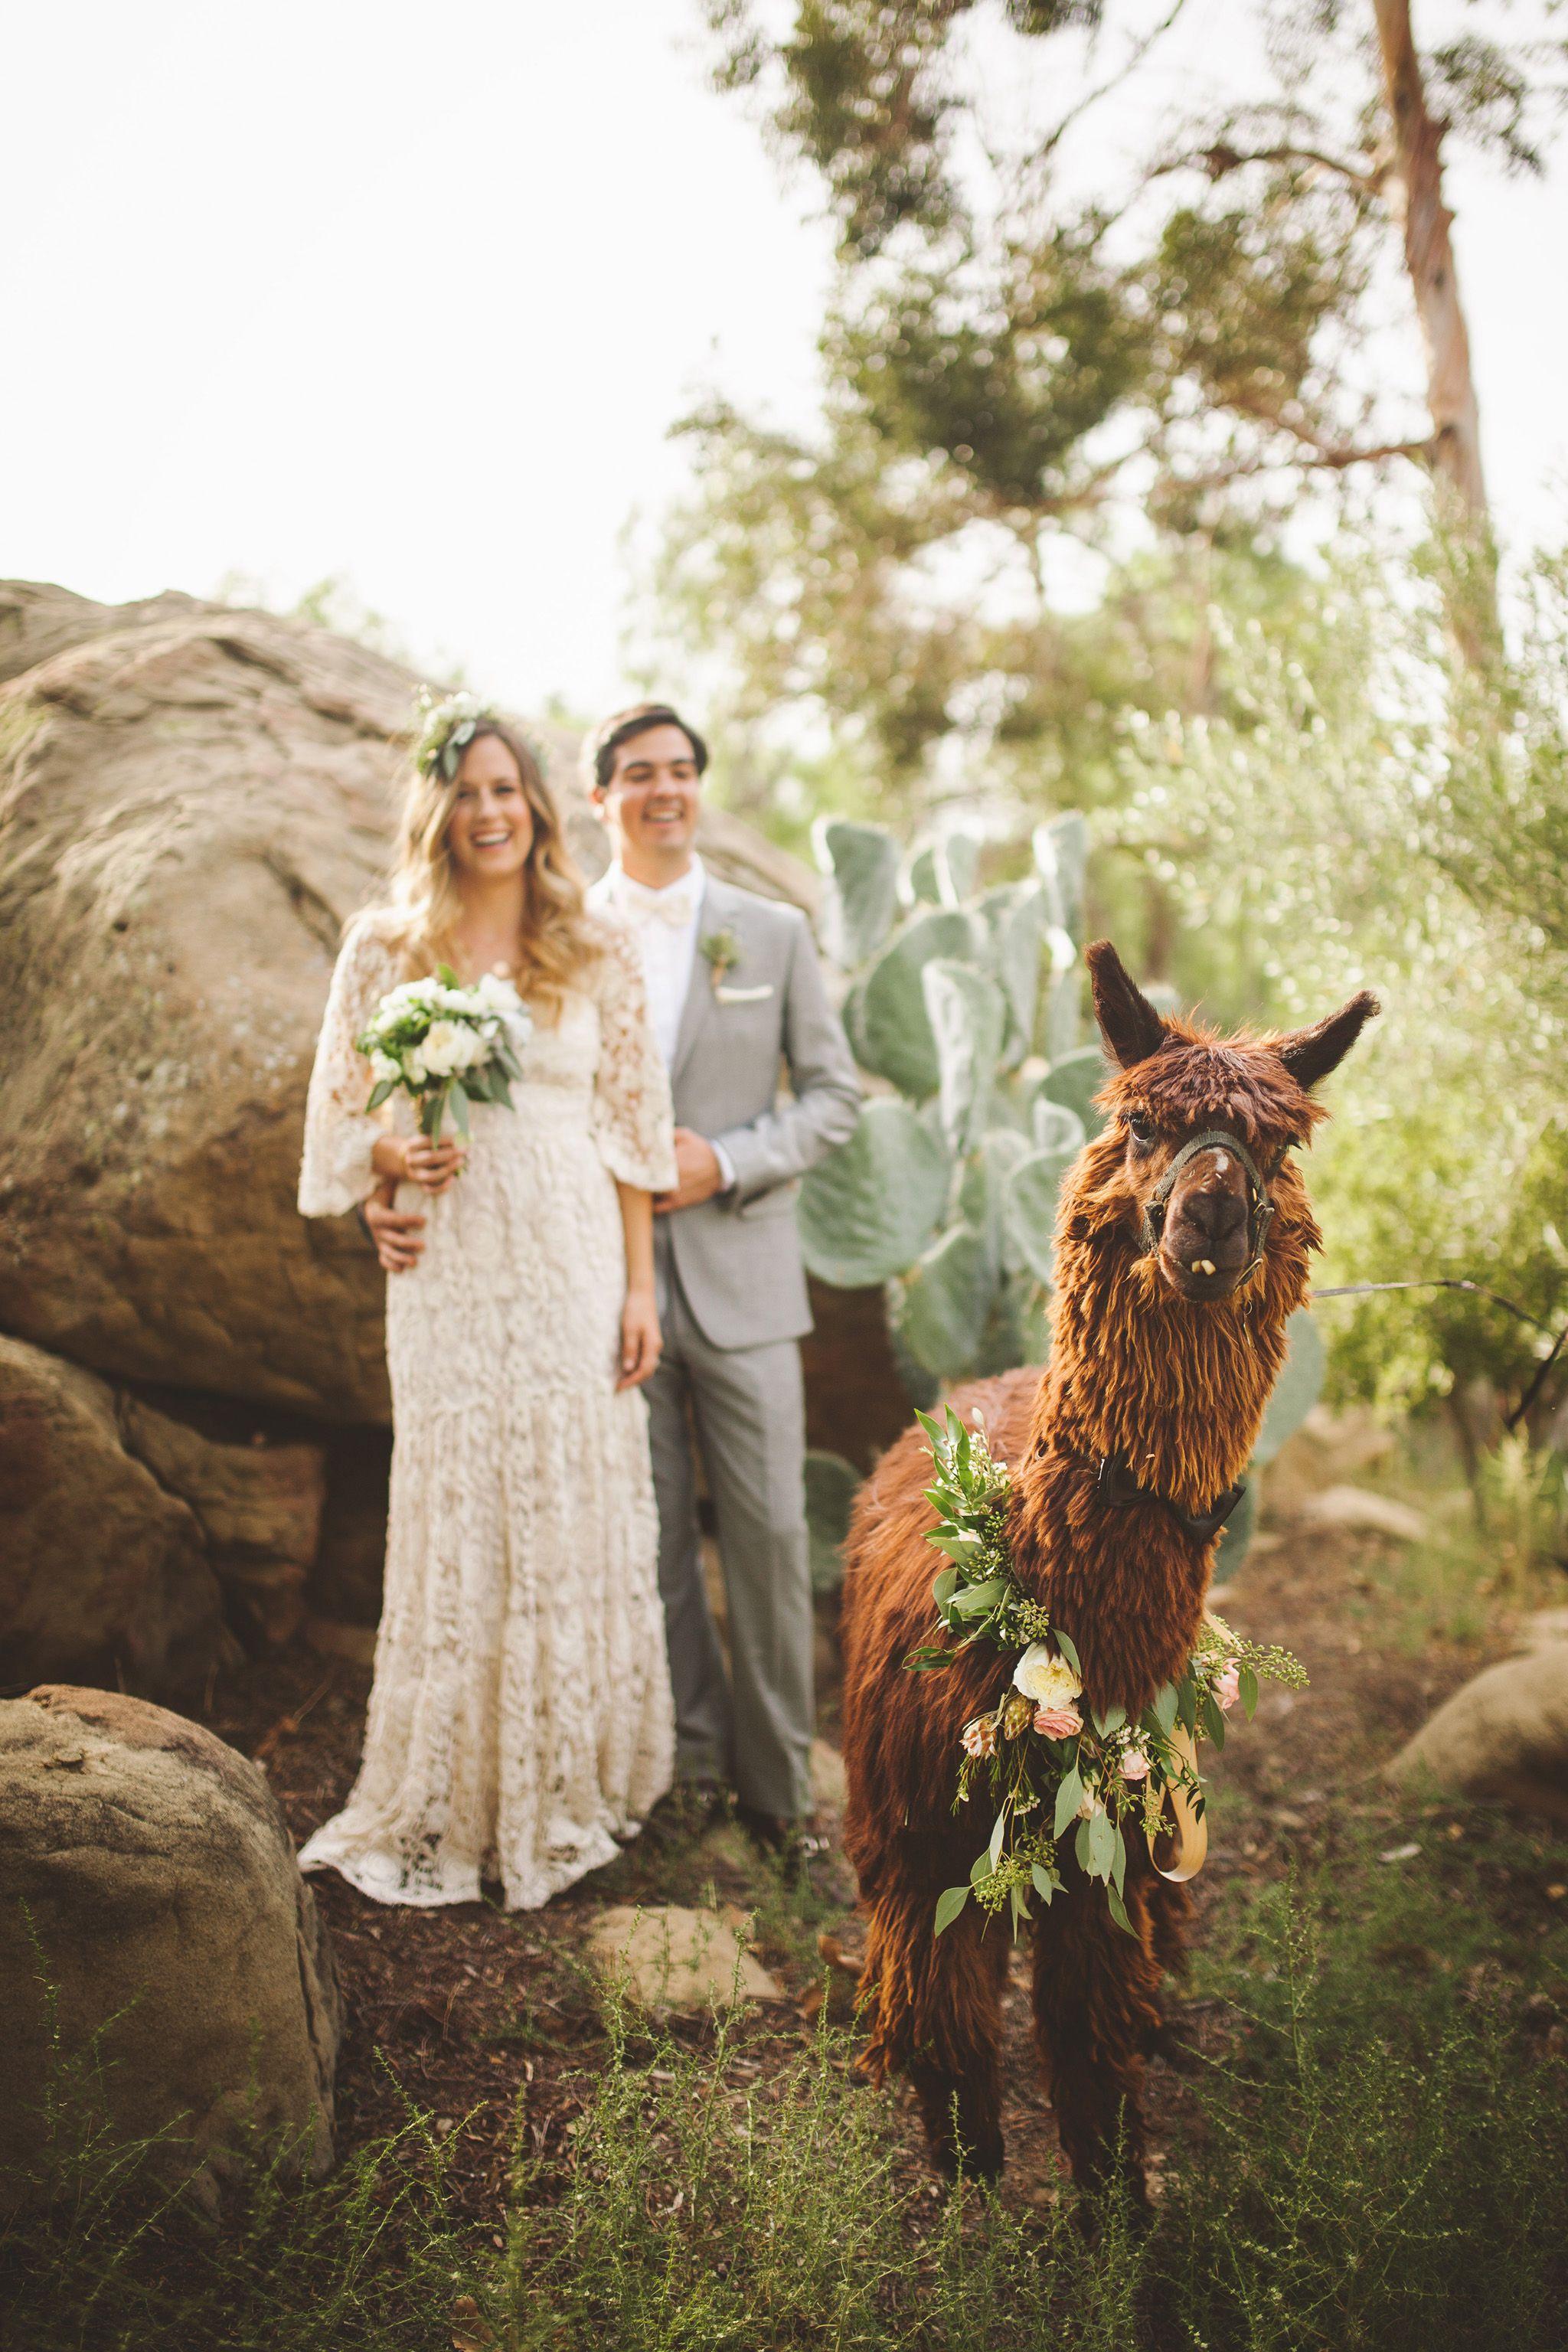 Los Angeles Wedding Photographer Hummingbird Nest Ranch Wedding Santa Susana Ca Wedding Pets Wedding Los Angeles Hummingbird Nest Ranch Wedding